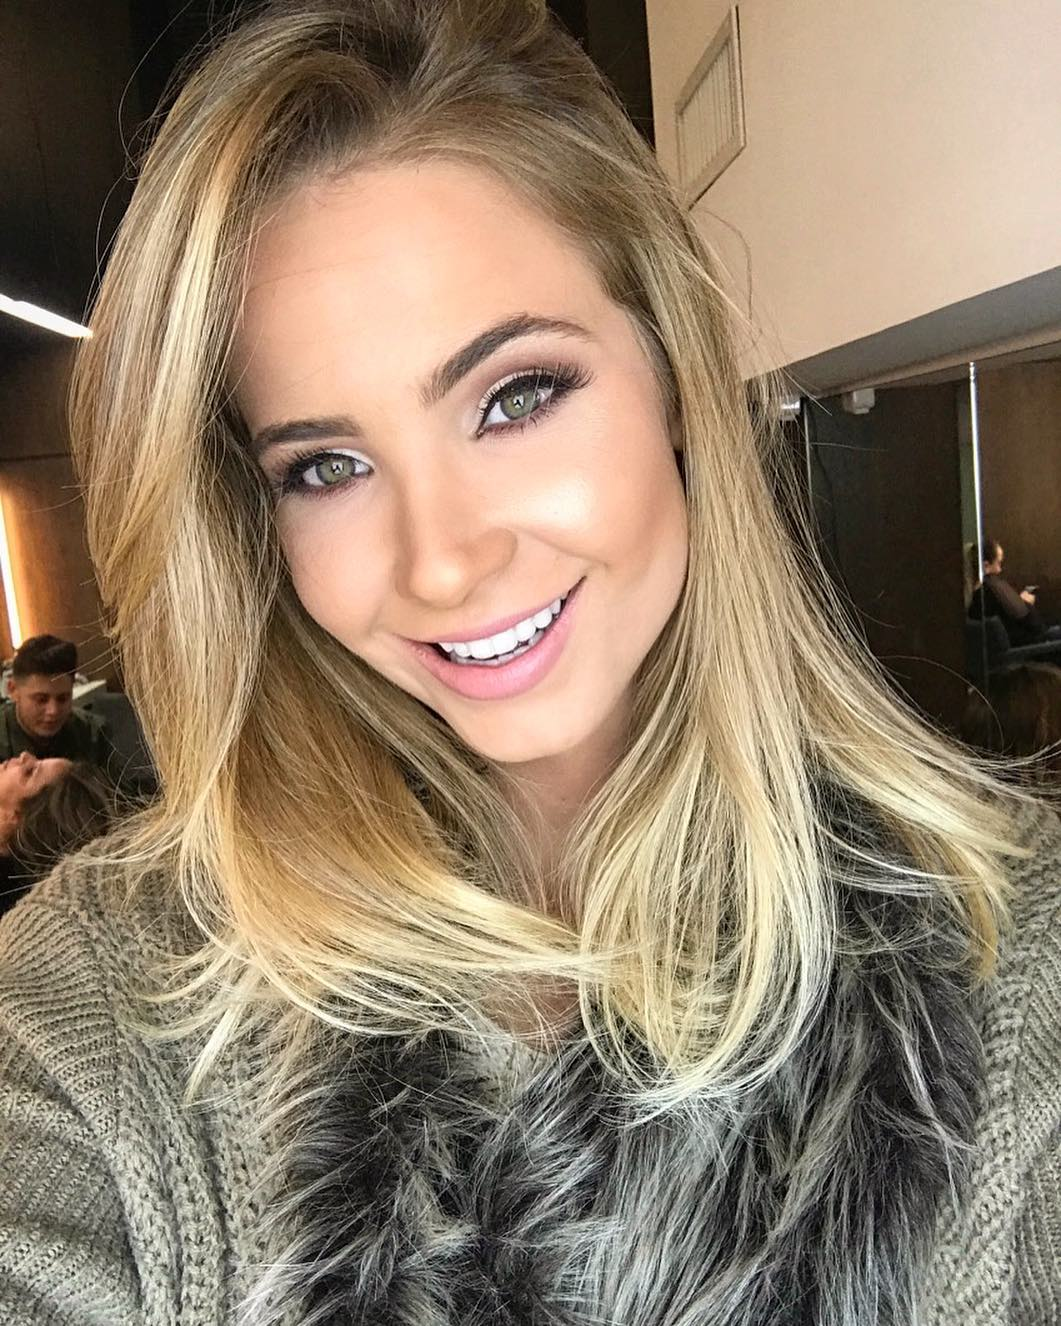 bruna vizintin, destituida do titulo de miss brasil terra 2017. - Página 3 Xsipl8g7